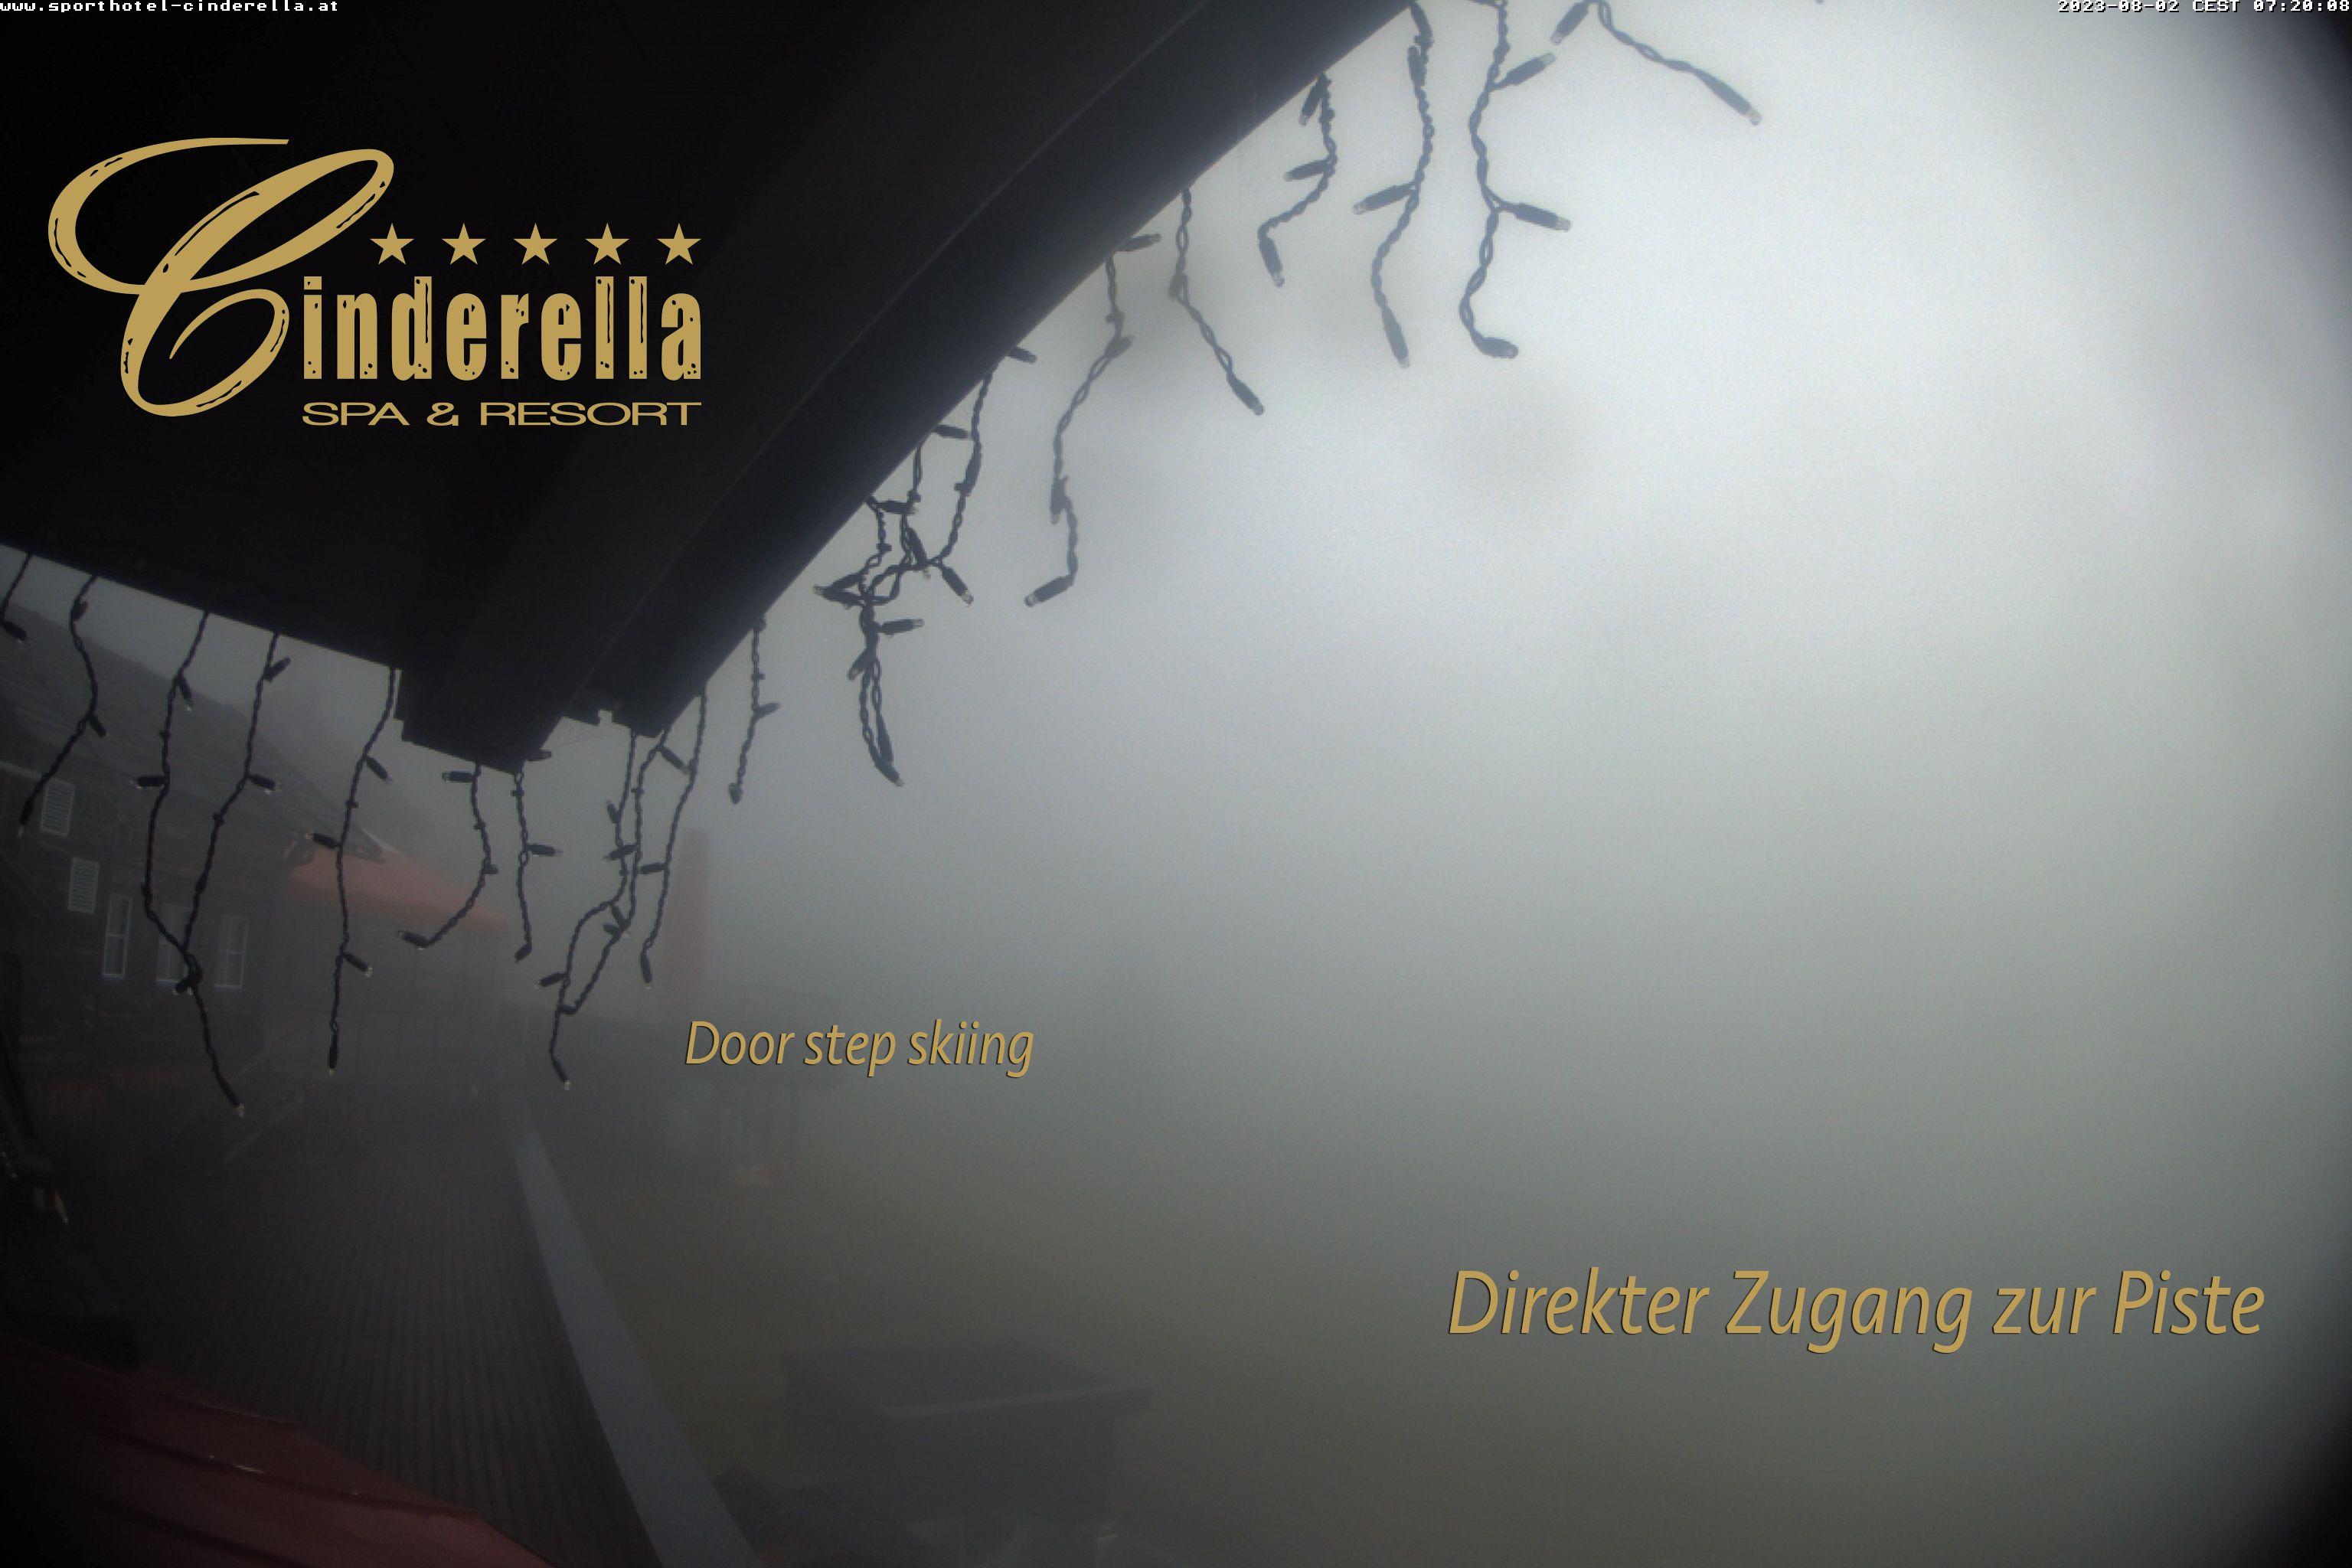 Webcam Gruberstadl Obertauern